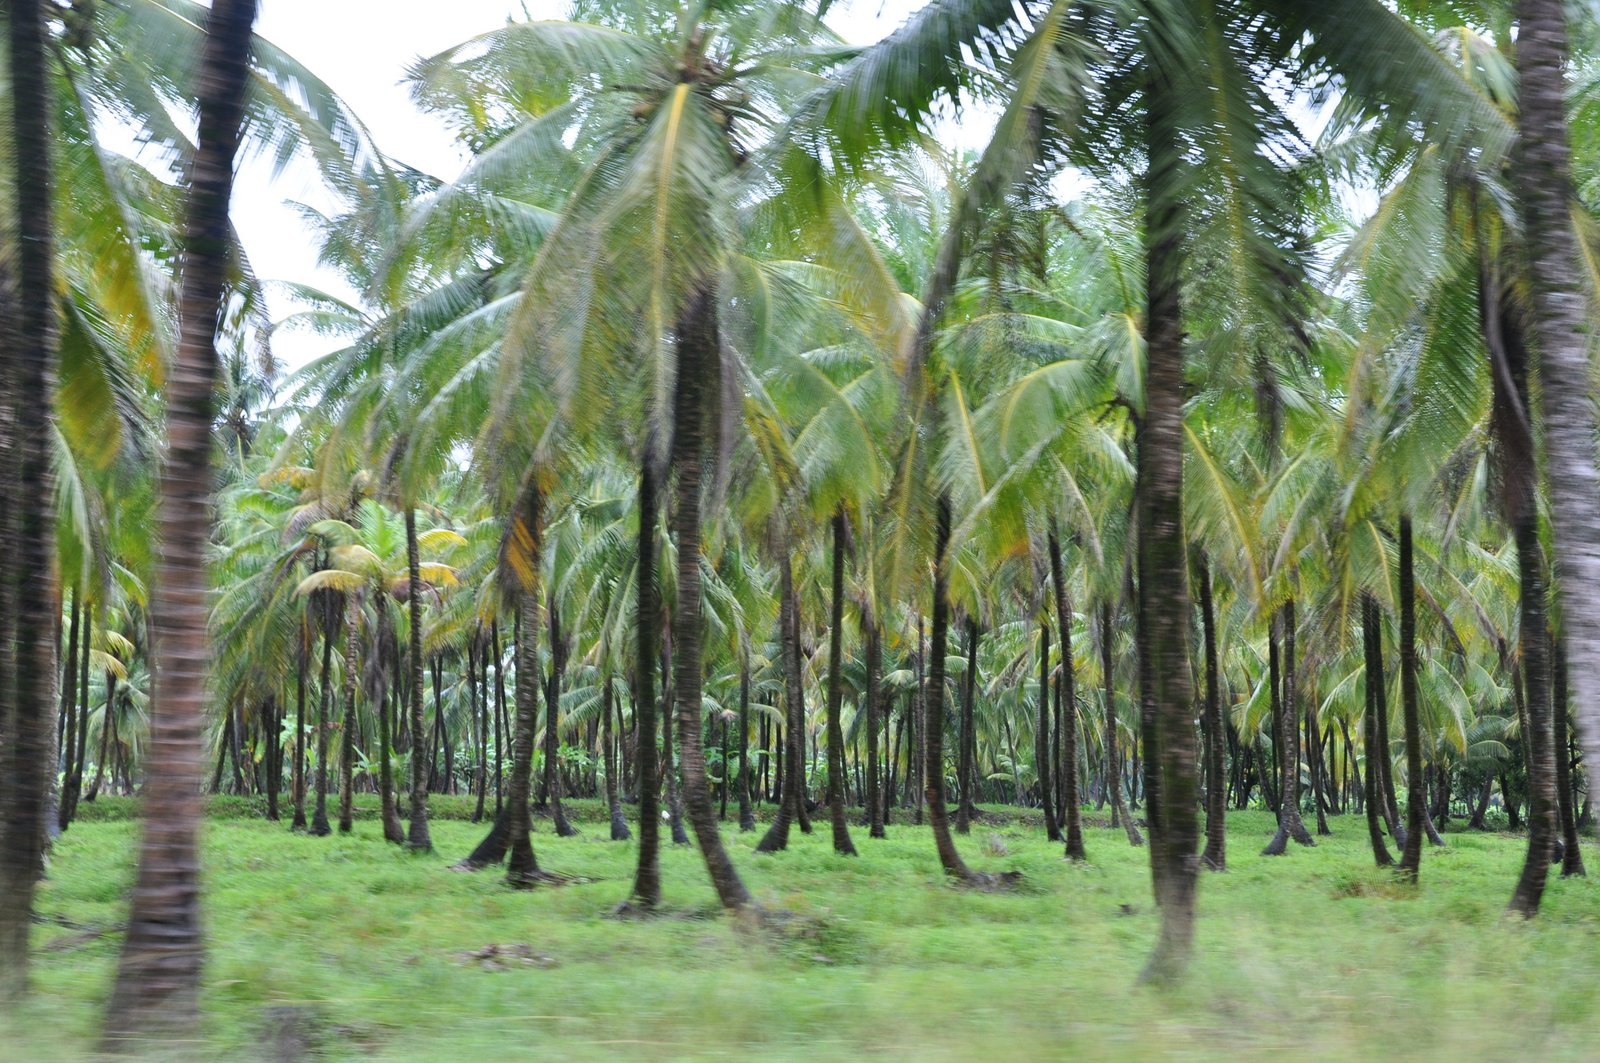 Coconut Grove in Wakenaam By Marco Farouk Basir, CC BY-SA 3.0,